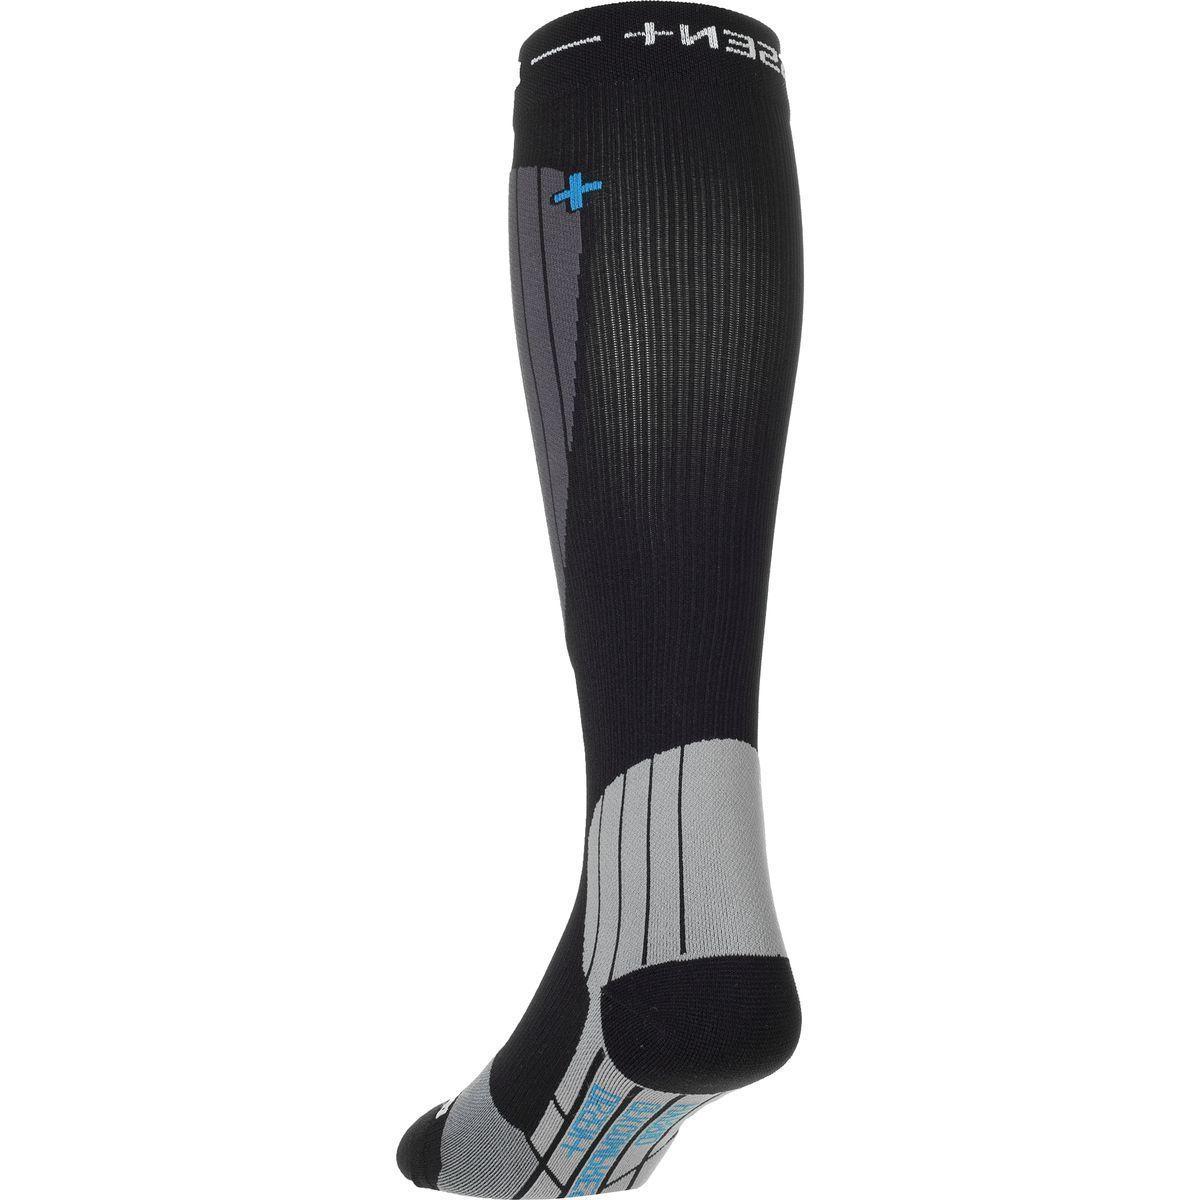 Dissent Ski GFX Compression Hybrid Protect Sock - Men's